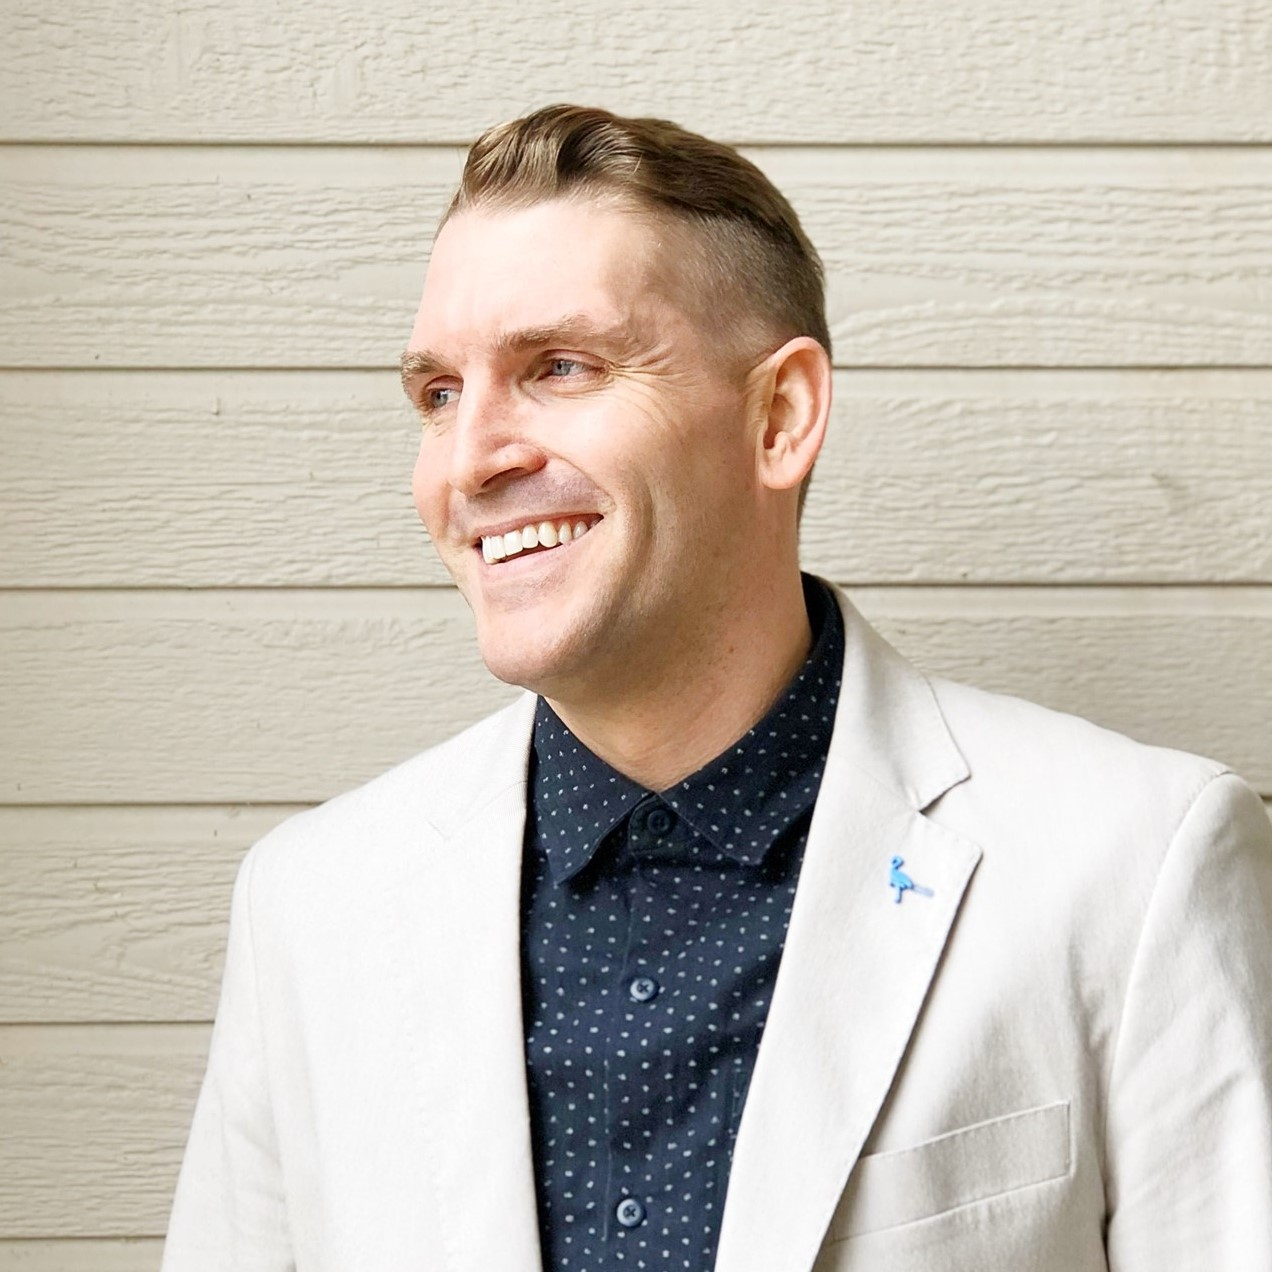 Marcus Yetter, DPM - Podiatrist in Laguna Beach, CA